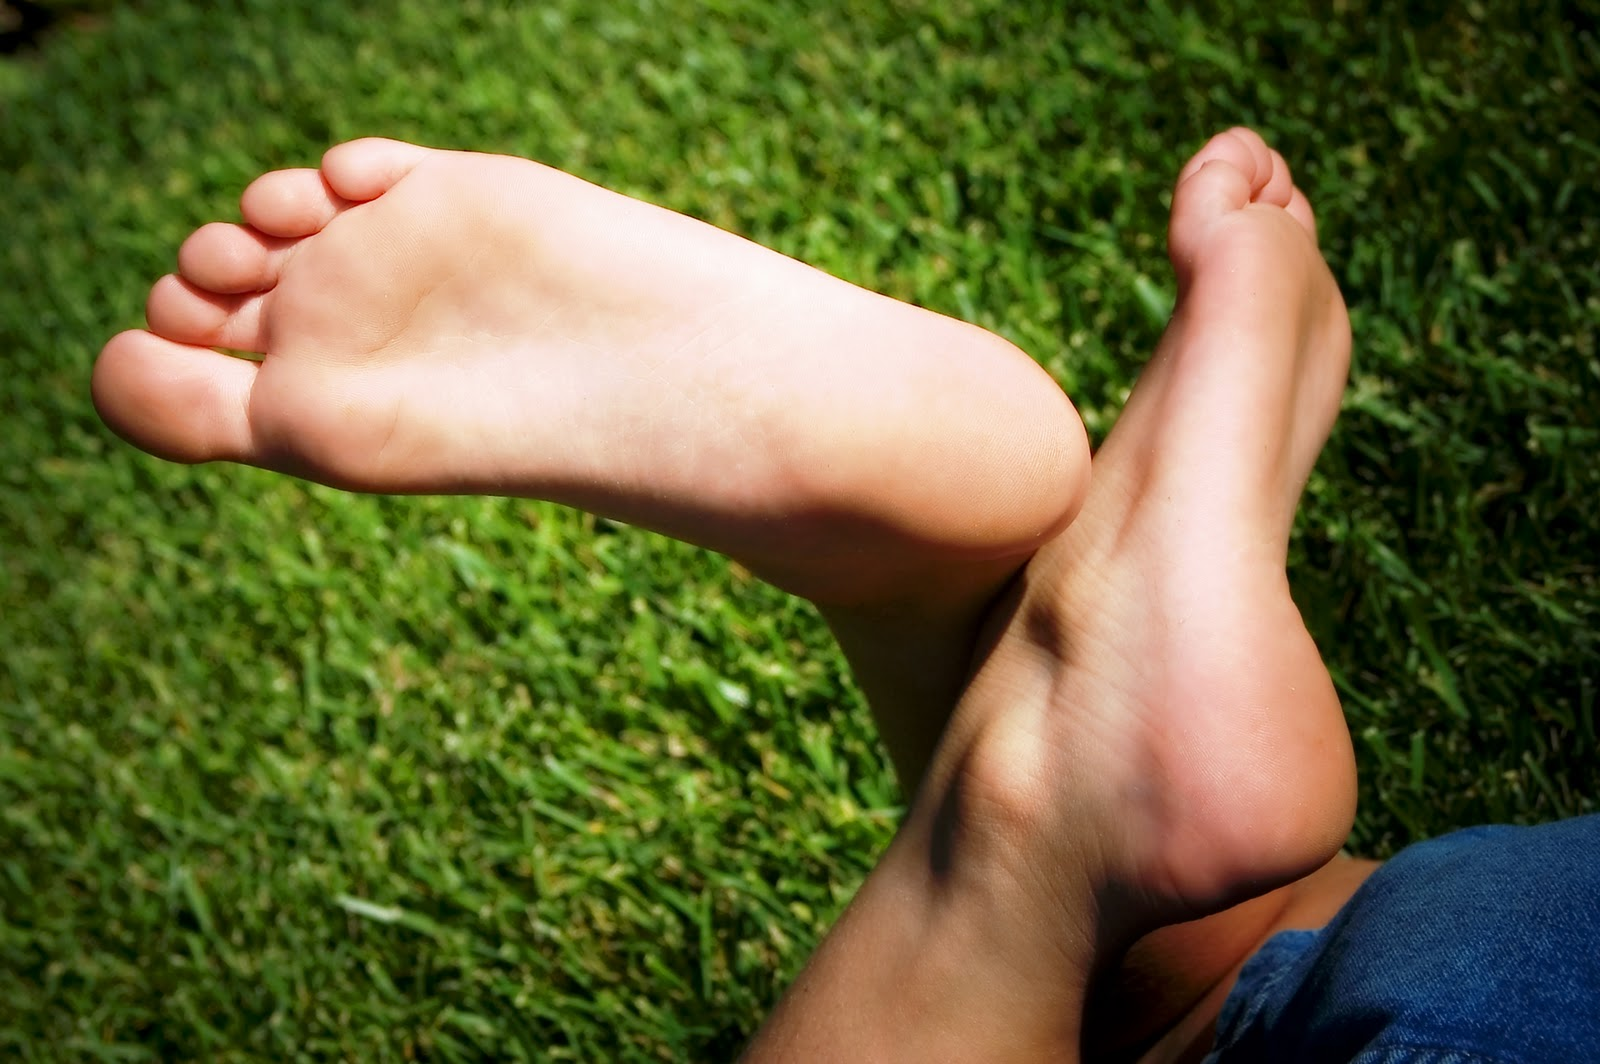 Child Feet Image 1600x1064